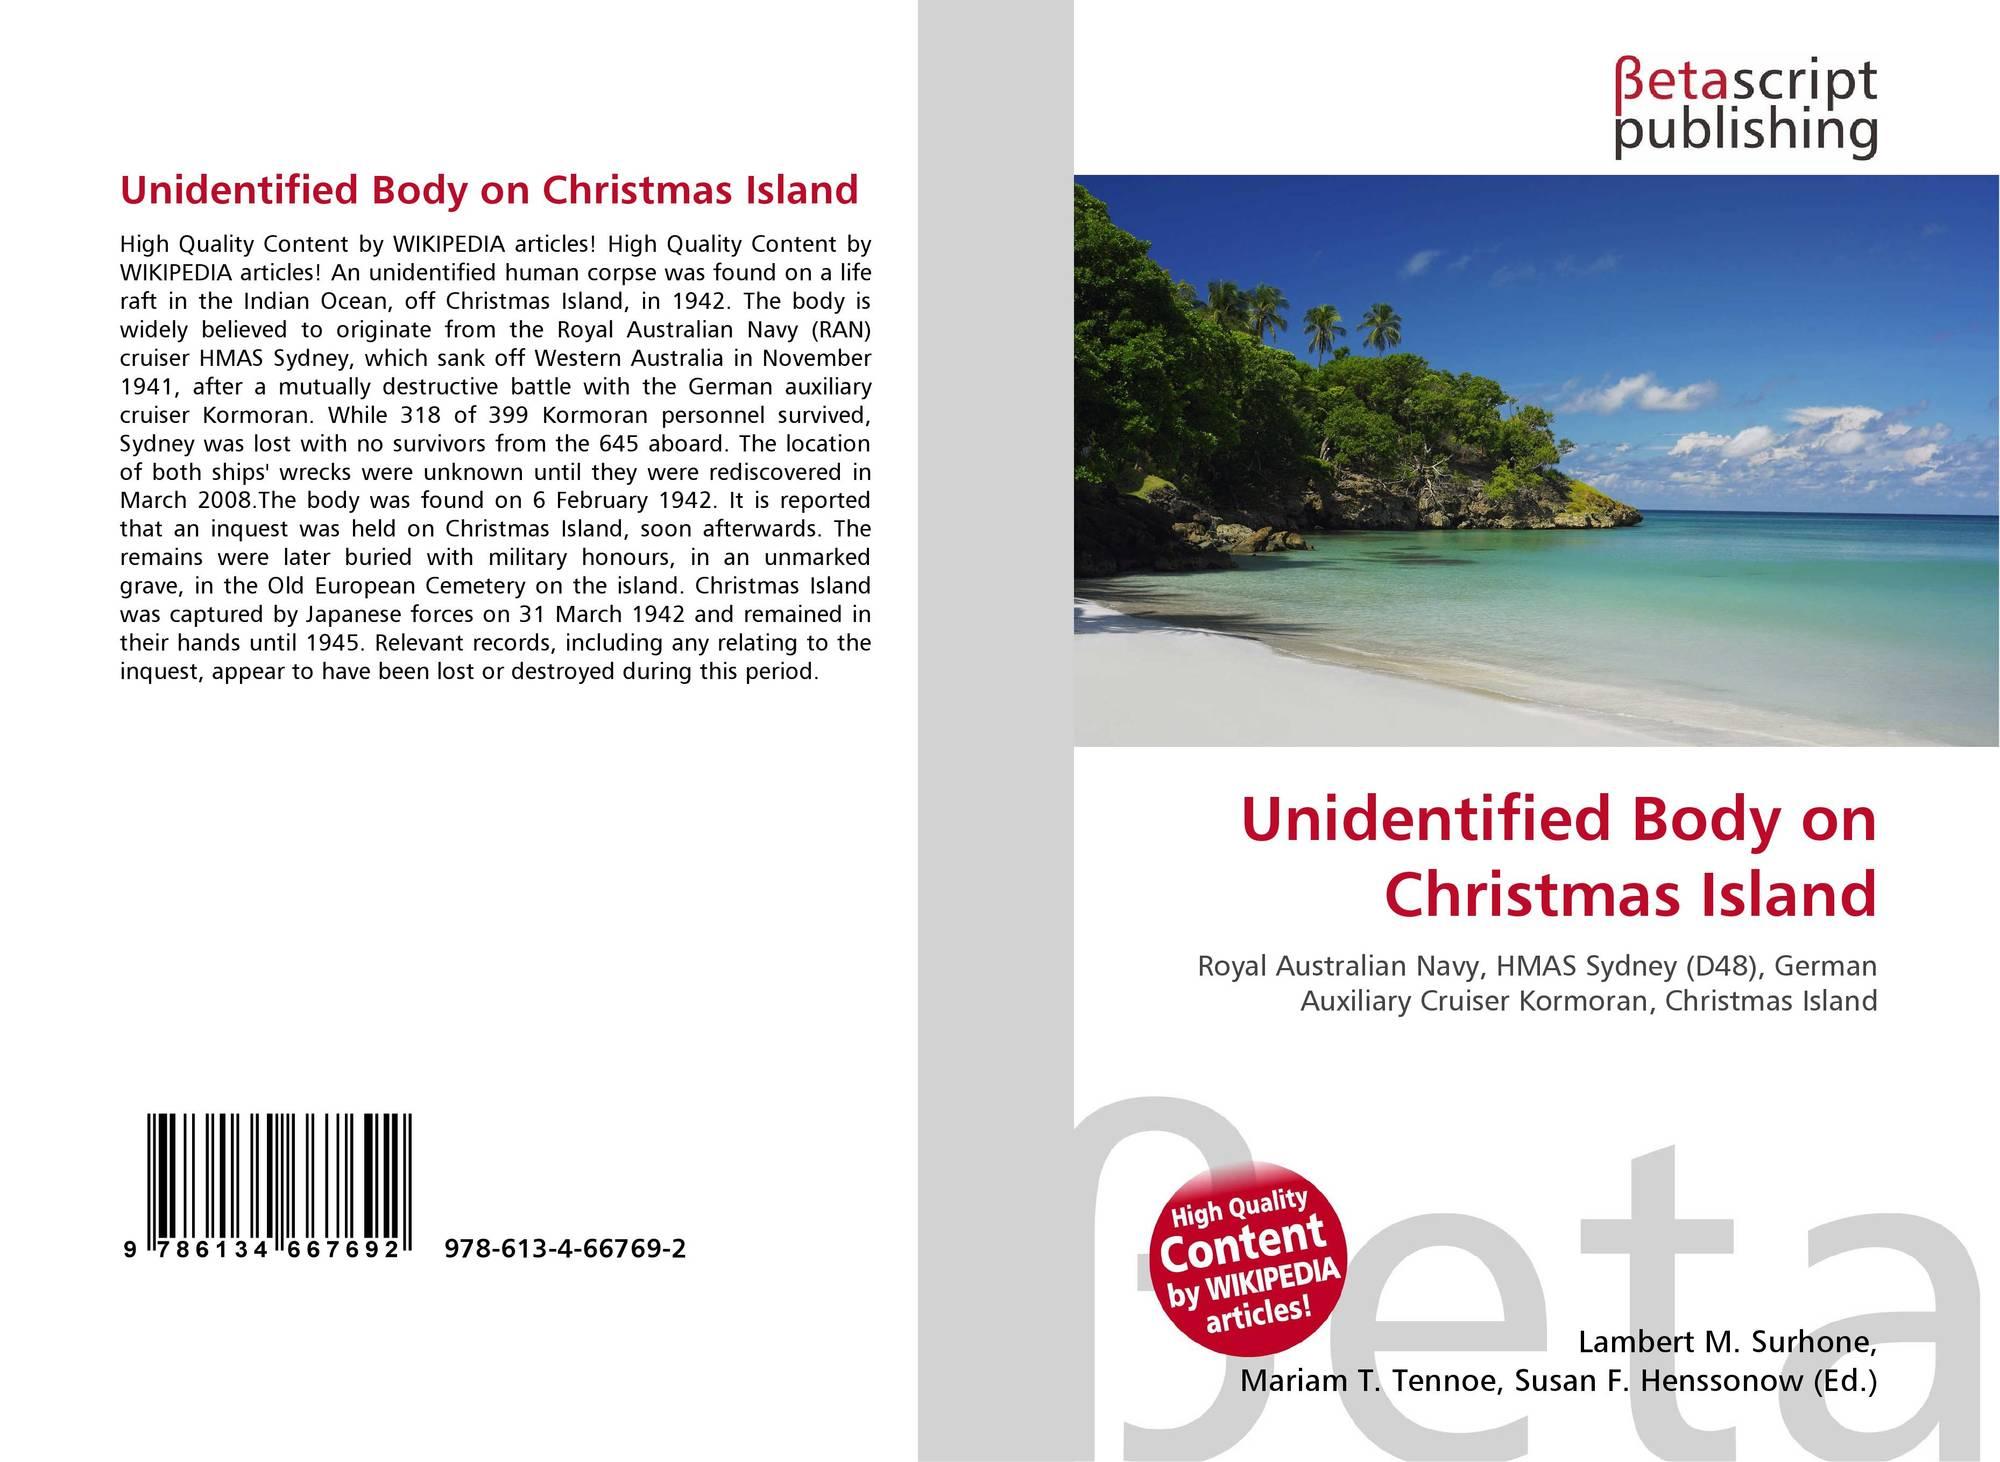 Unidentified Body on Christmas Island, 978-613-4-66769-2, 6134667692 ...